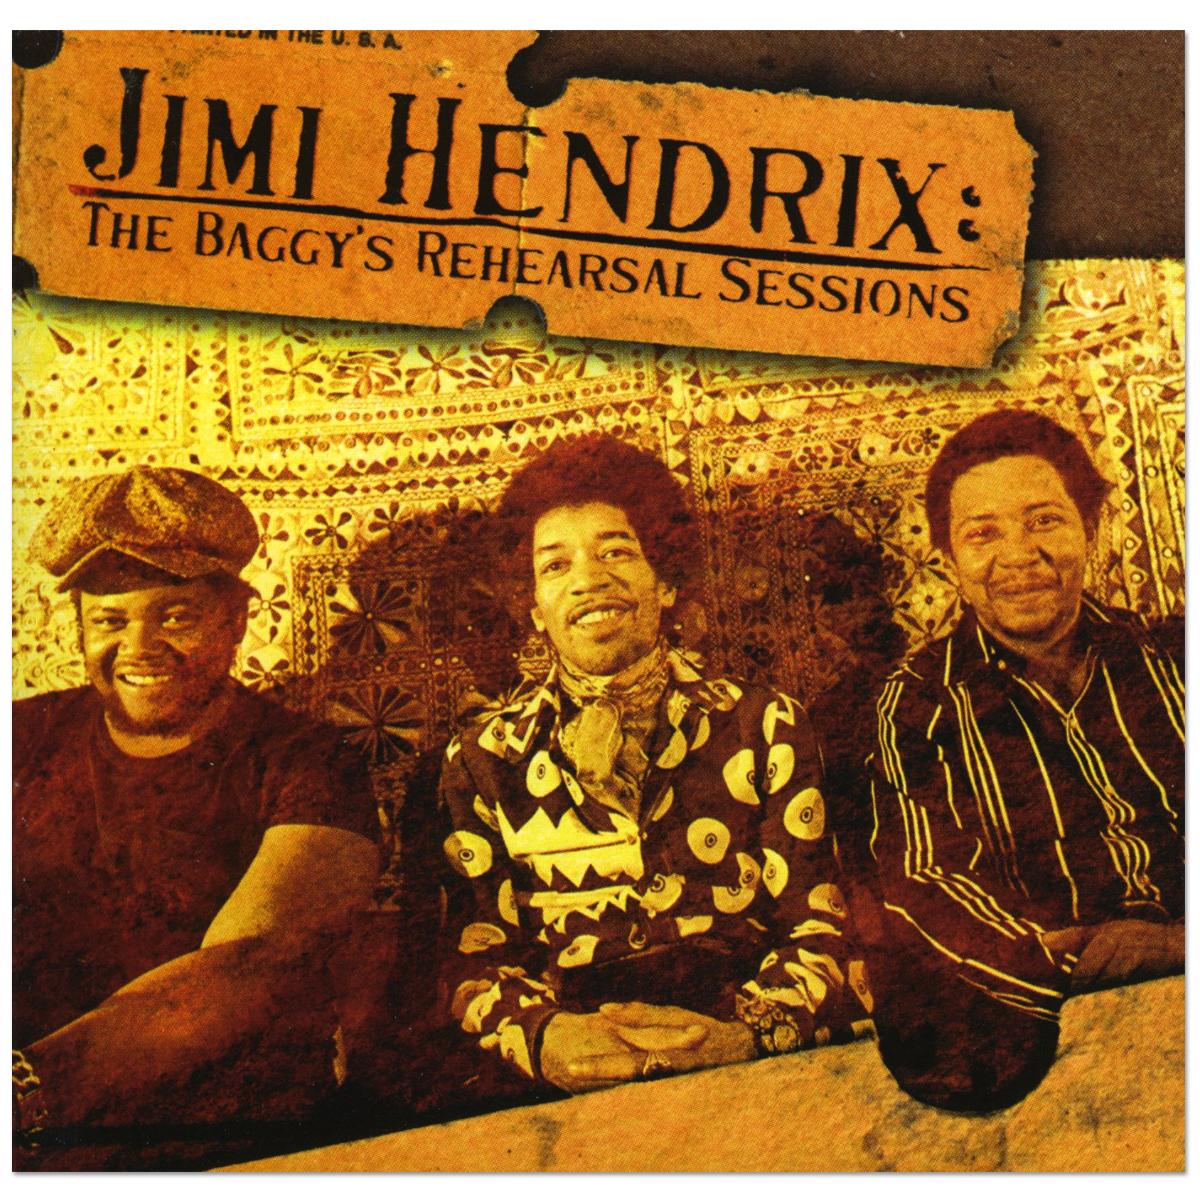 Jimi Hendrix: The Baggys Rehearsal Sessions DAGGER RECORDS CD